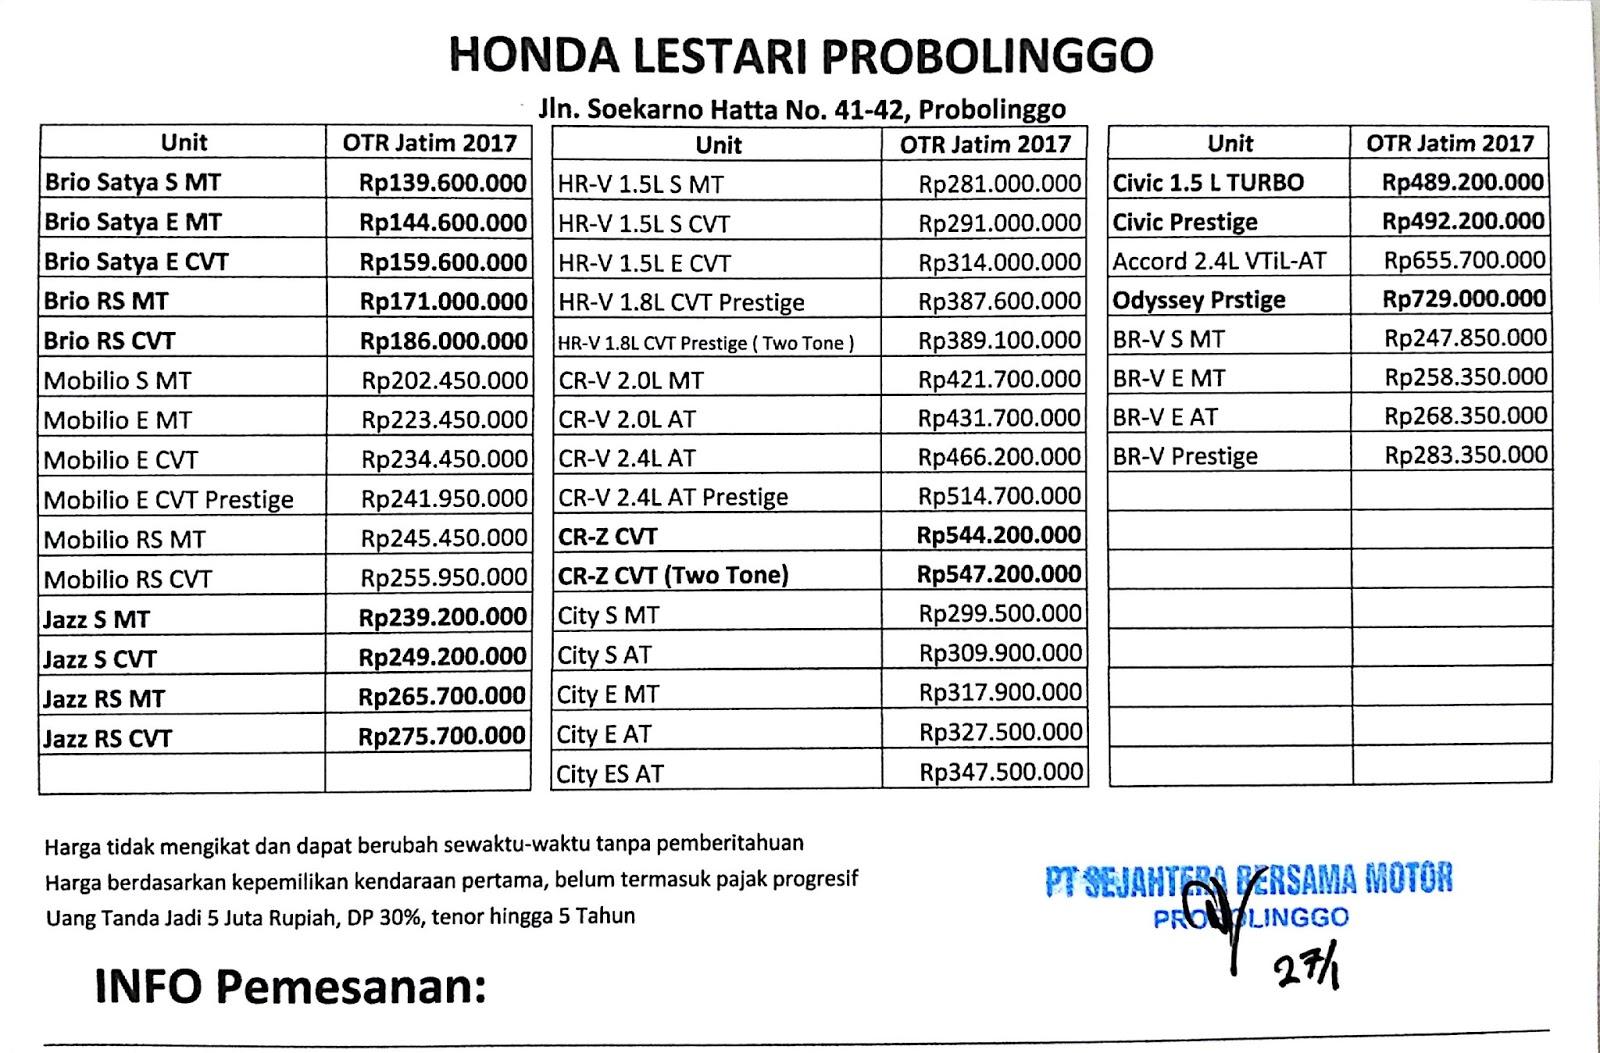 Honda Lestari Probolinggo Honda Lestari Probolinggo